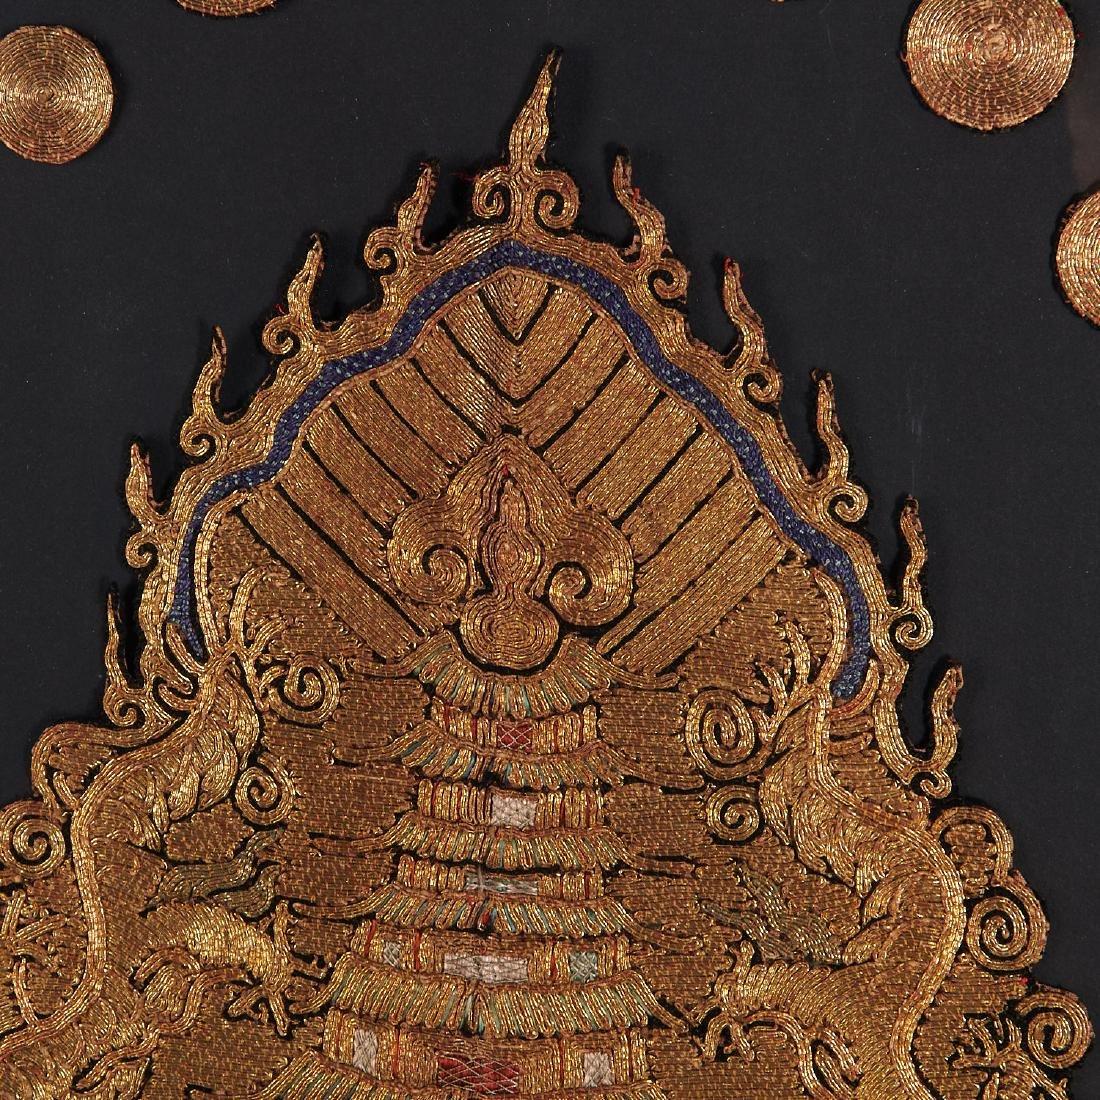 (2) Framed Chinese opera costume panels - 4